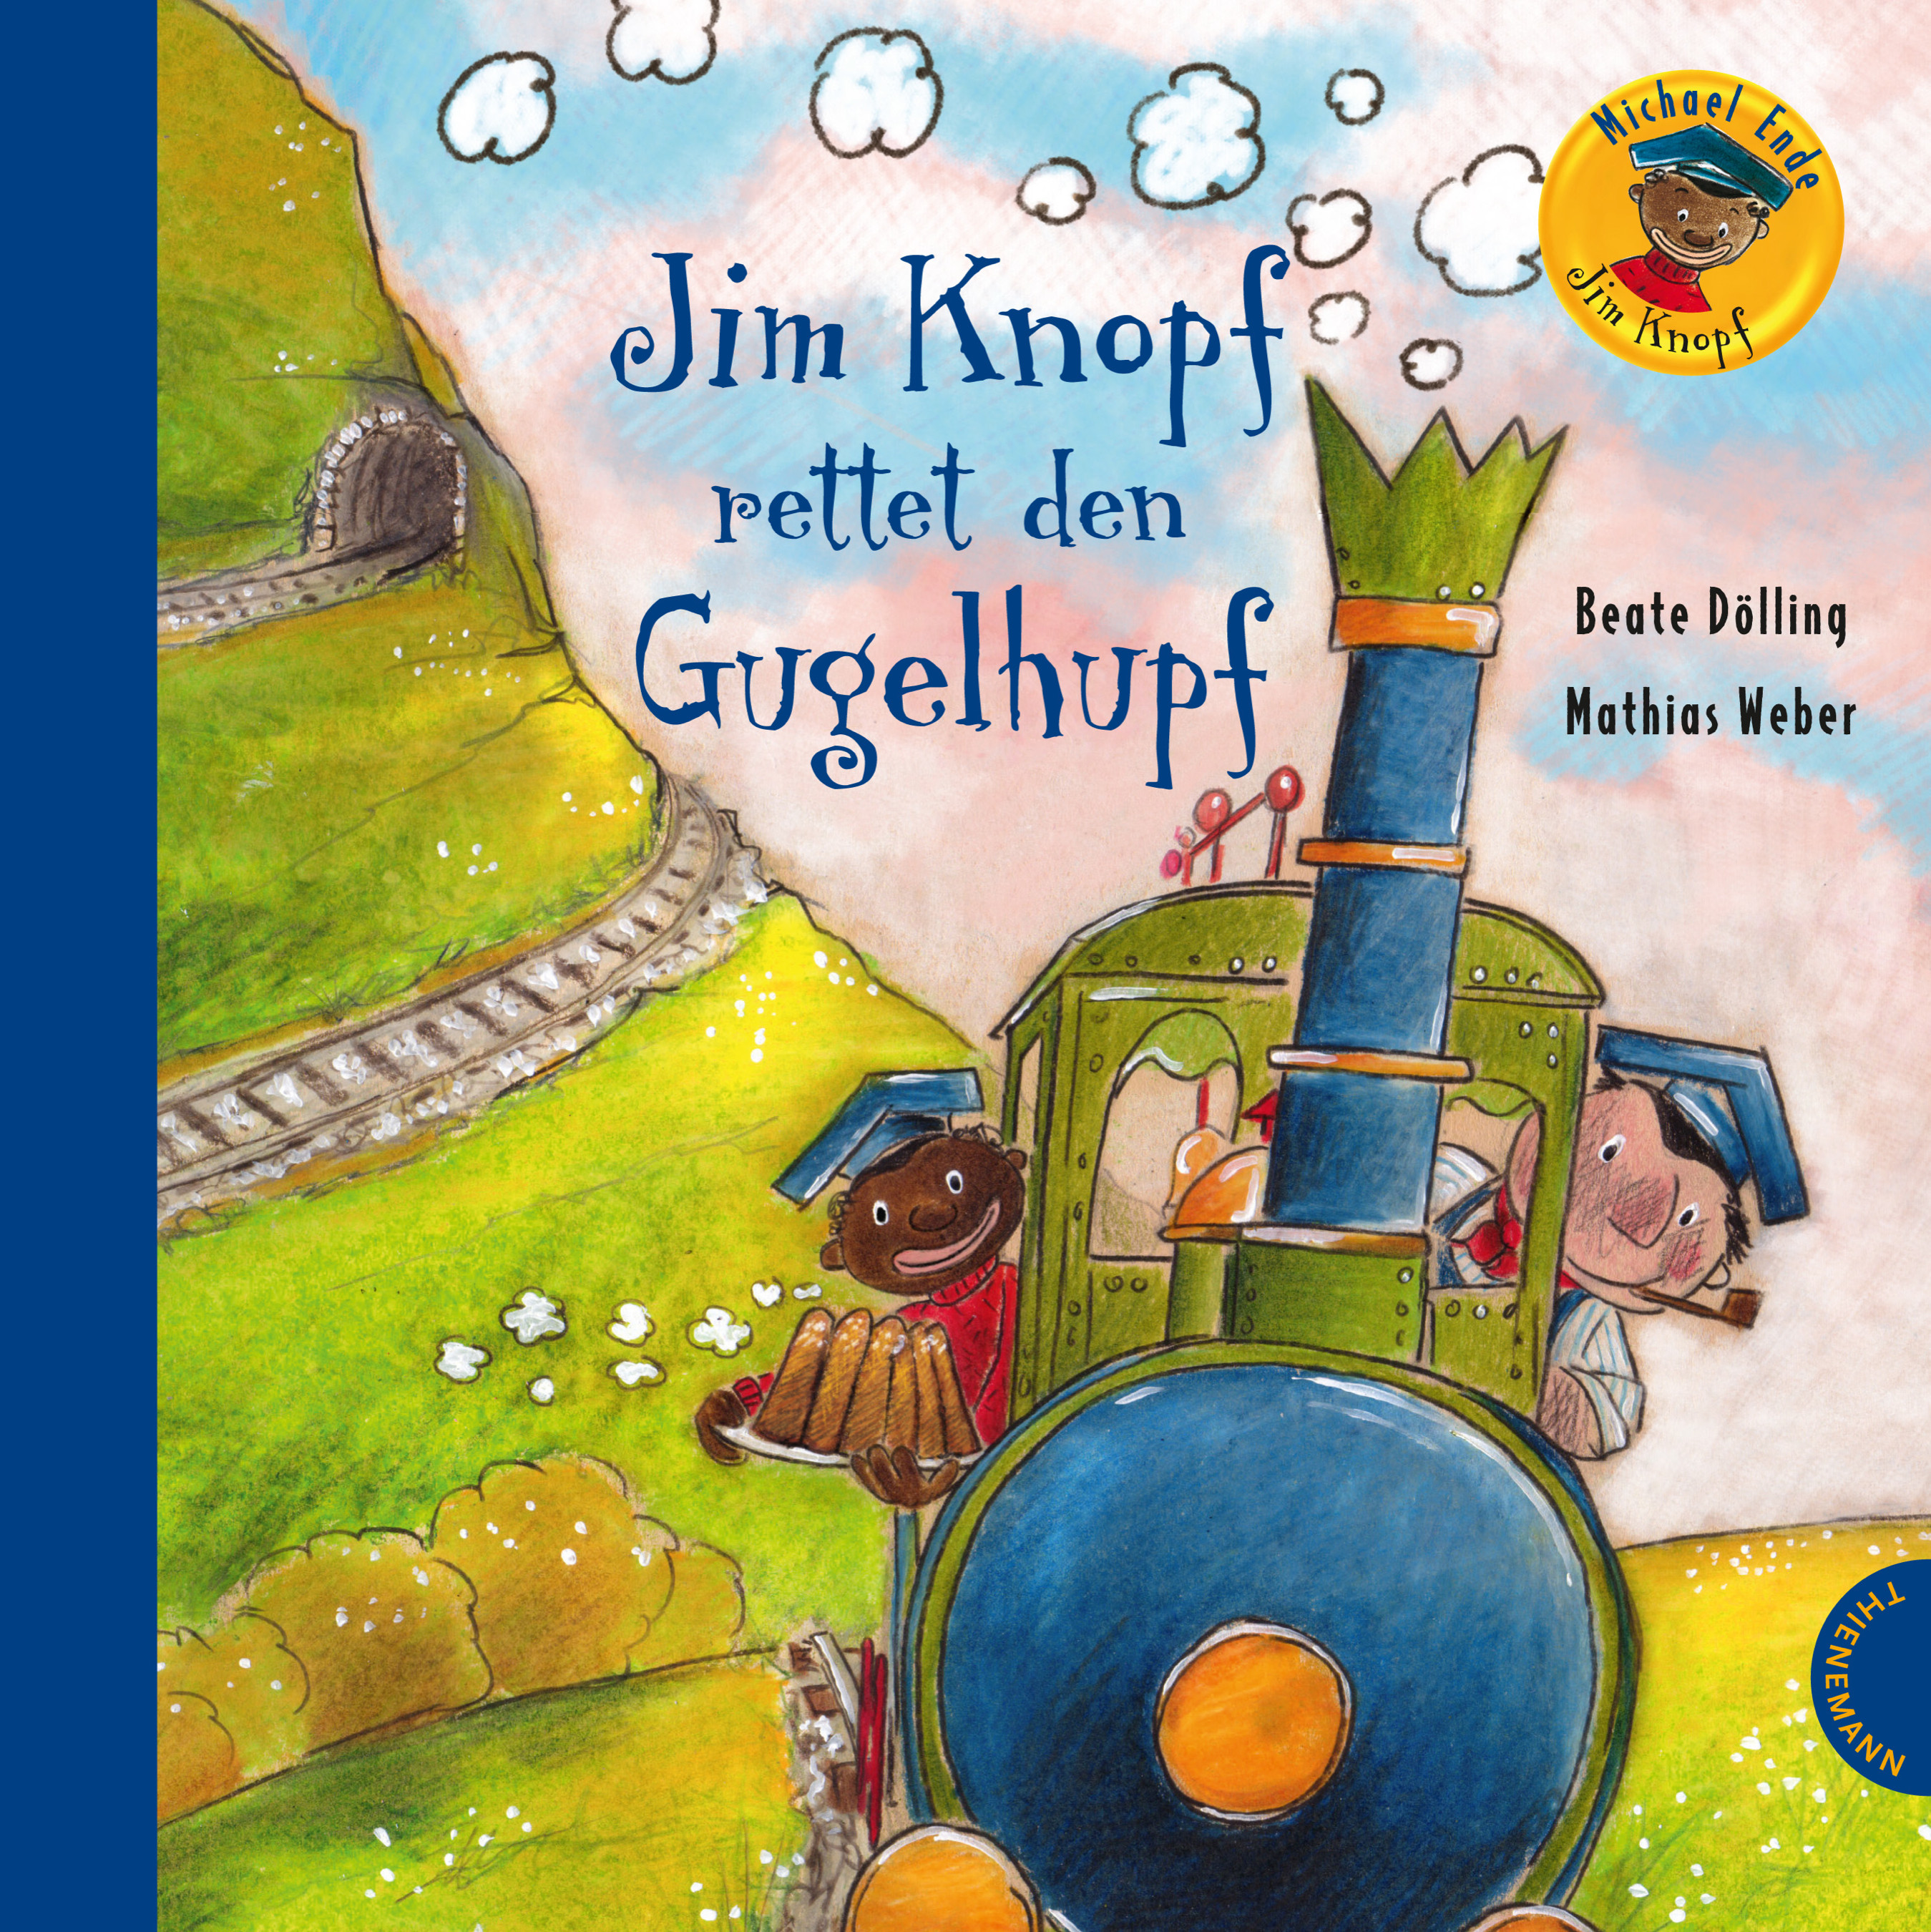 Jim Knopf: Jim Knopf rettet den Gugelhupf, Beate Dölling